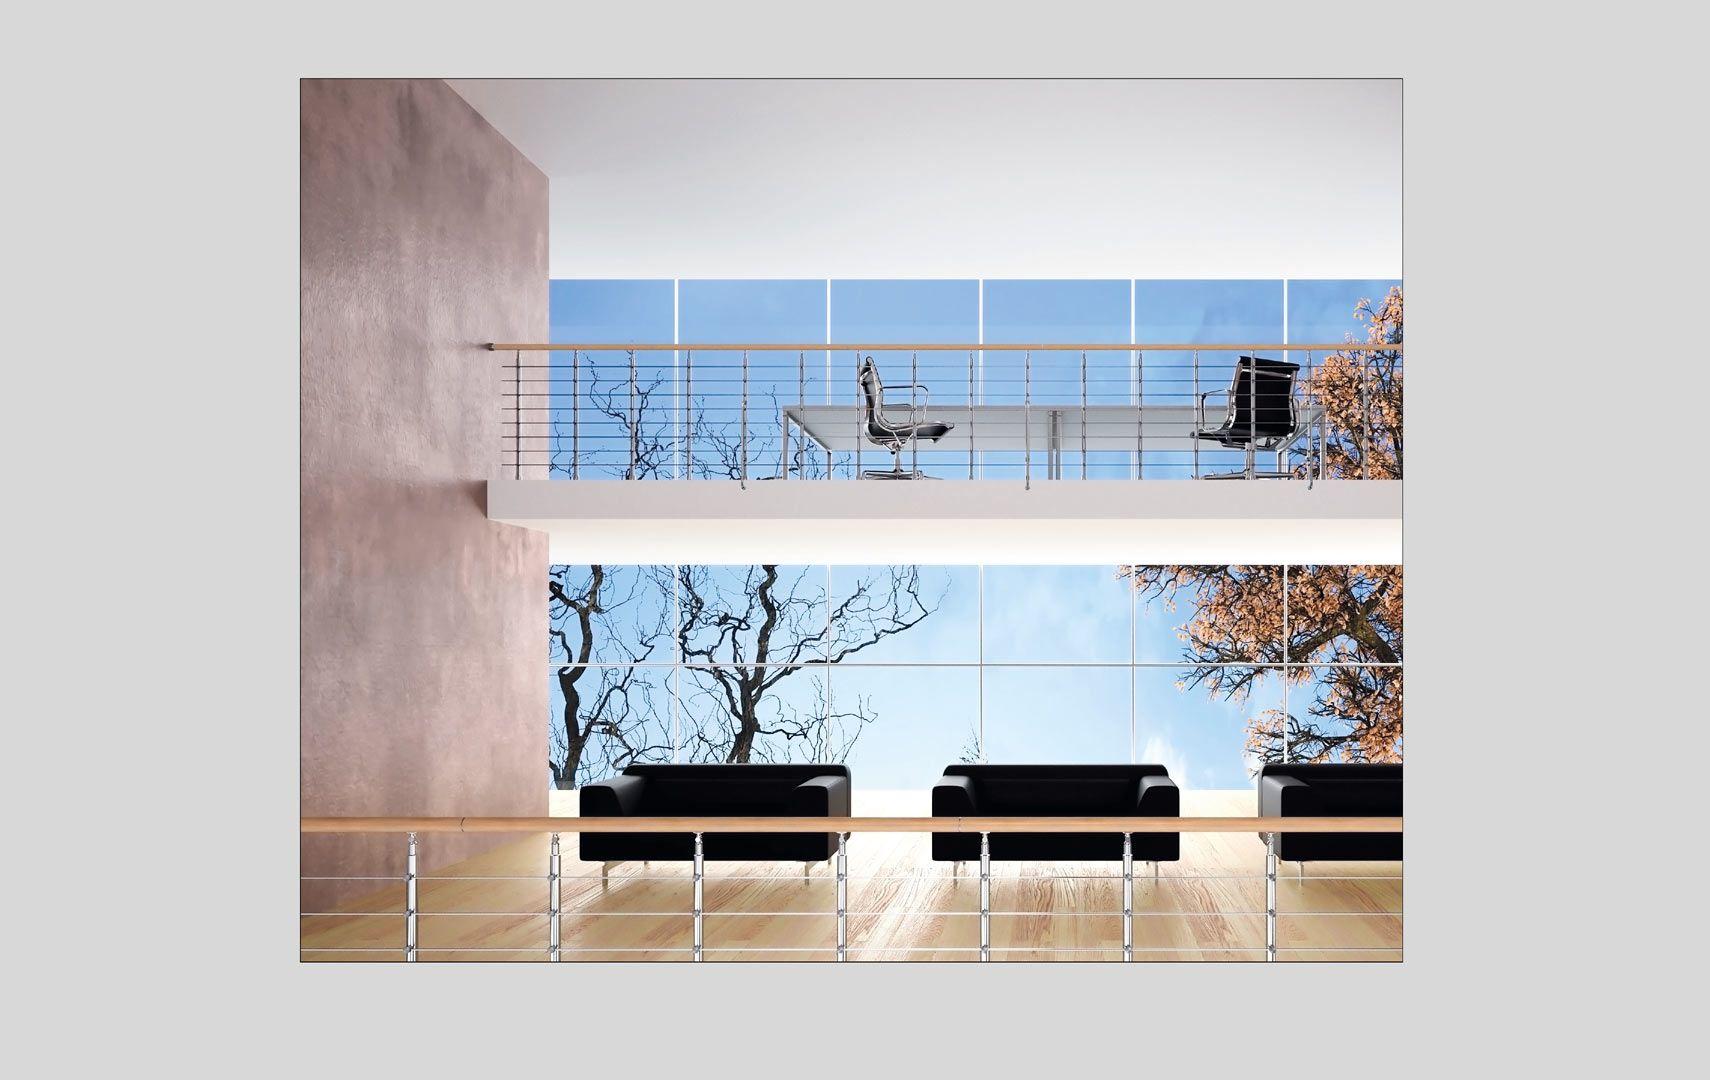 Ringhiere per scale ringhiere per scale interne parapetti parapetti per scale ringhiere in - Parapetti in vetro per scale ...